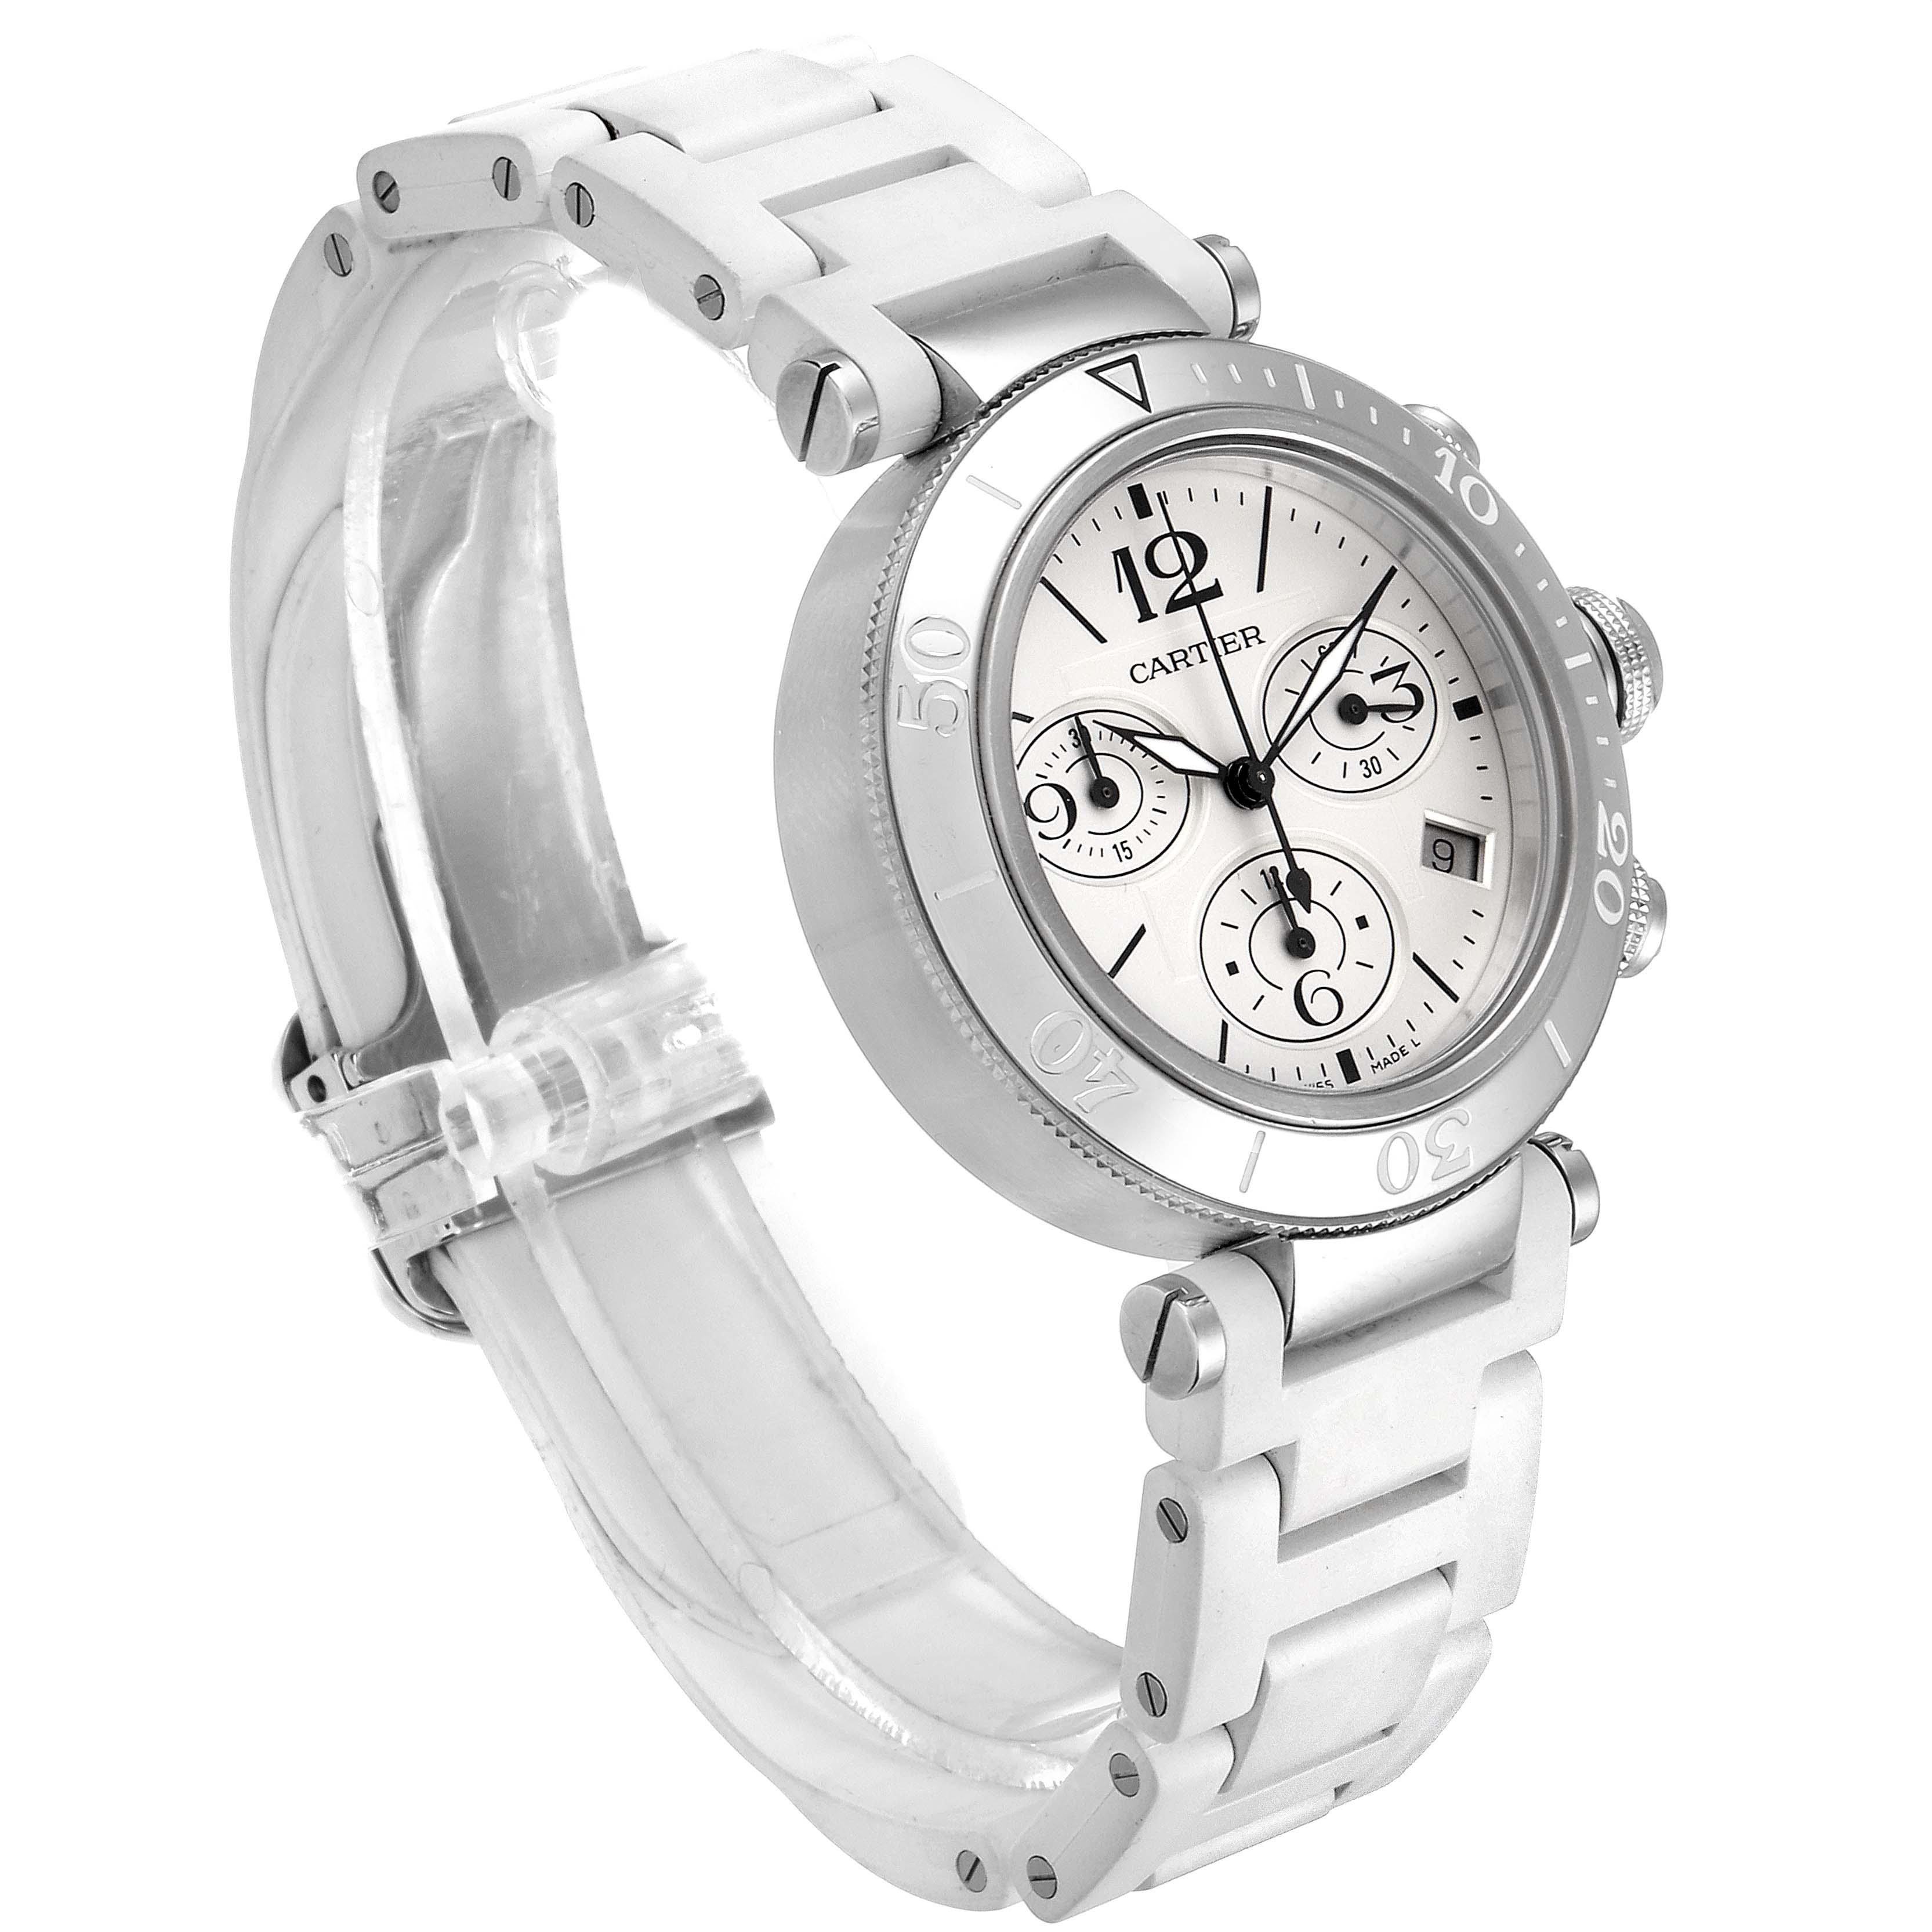 Cartier Pasha Seatimer Chronograph Rubber Strap Ladies Watch W3140005 SwissWatchExpo